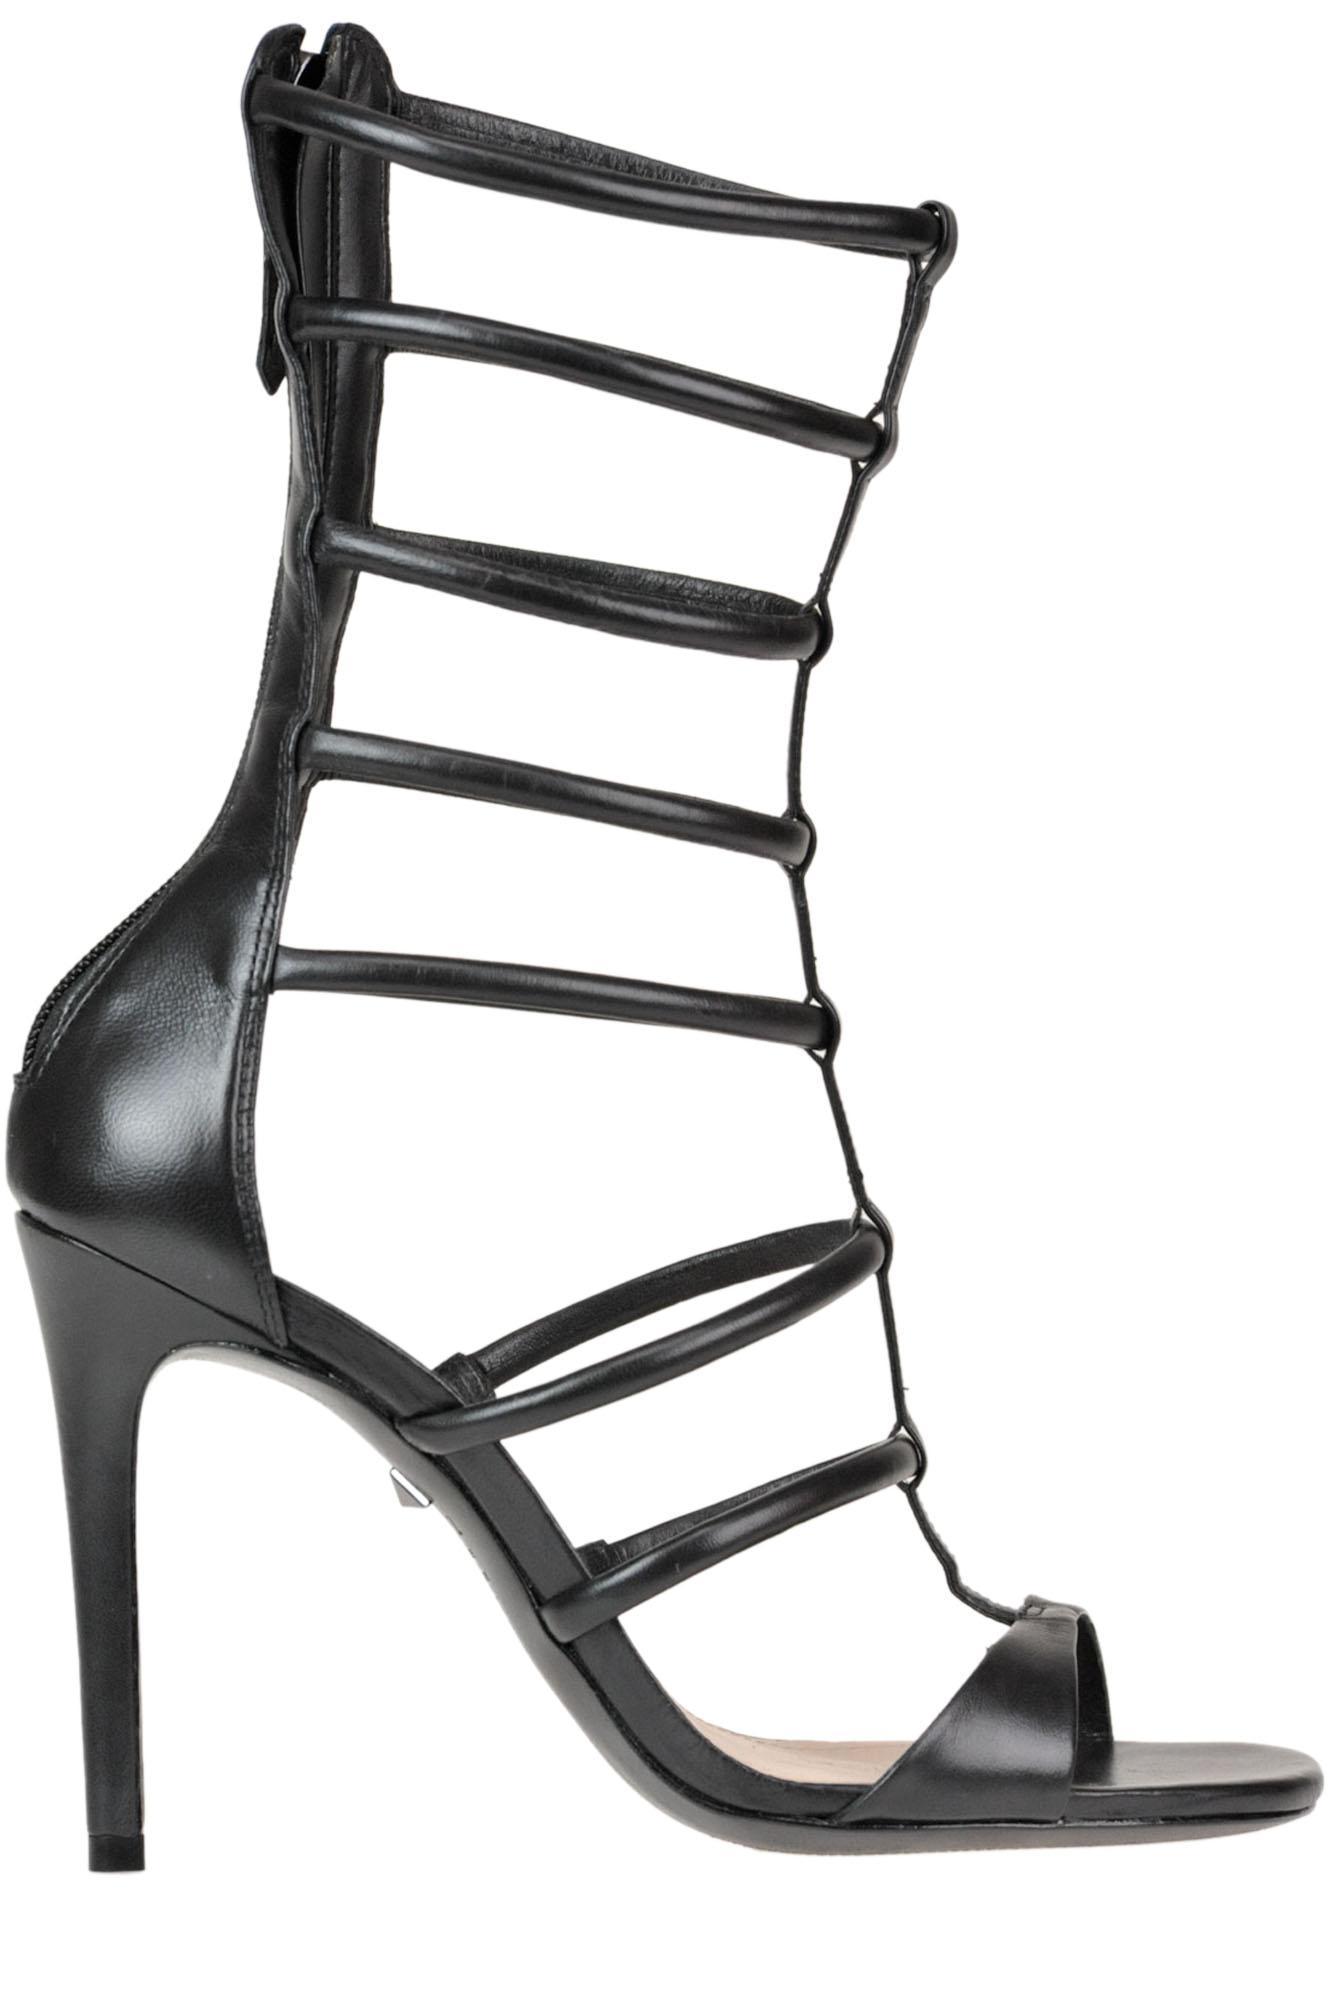 80d61de280f490 Schutz Leather Gladiator Sandals in Black - Lyst